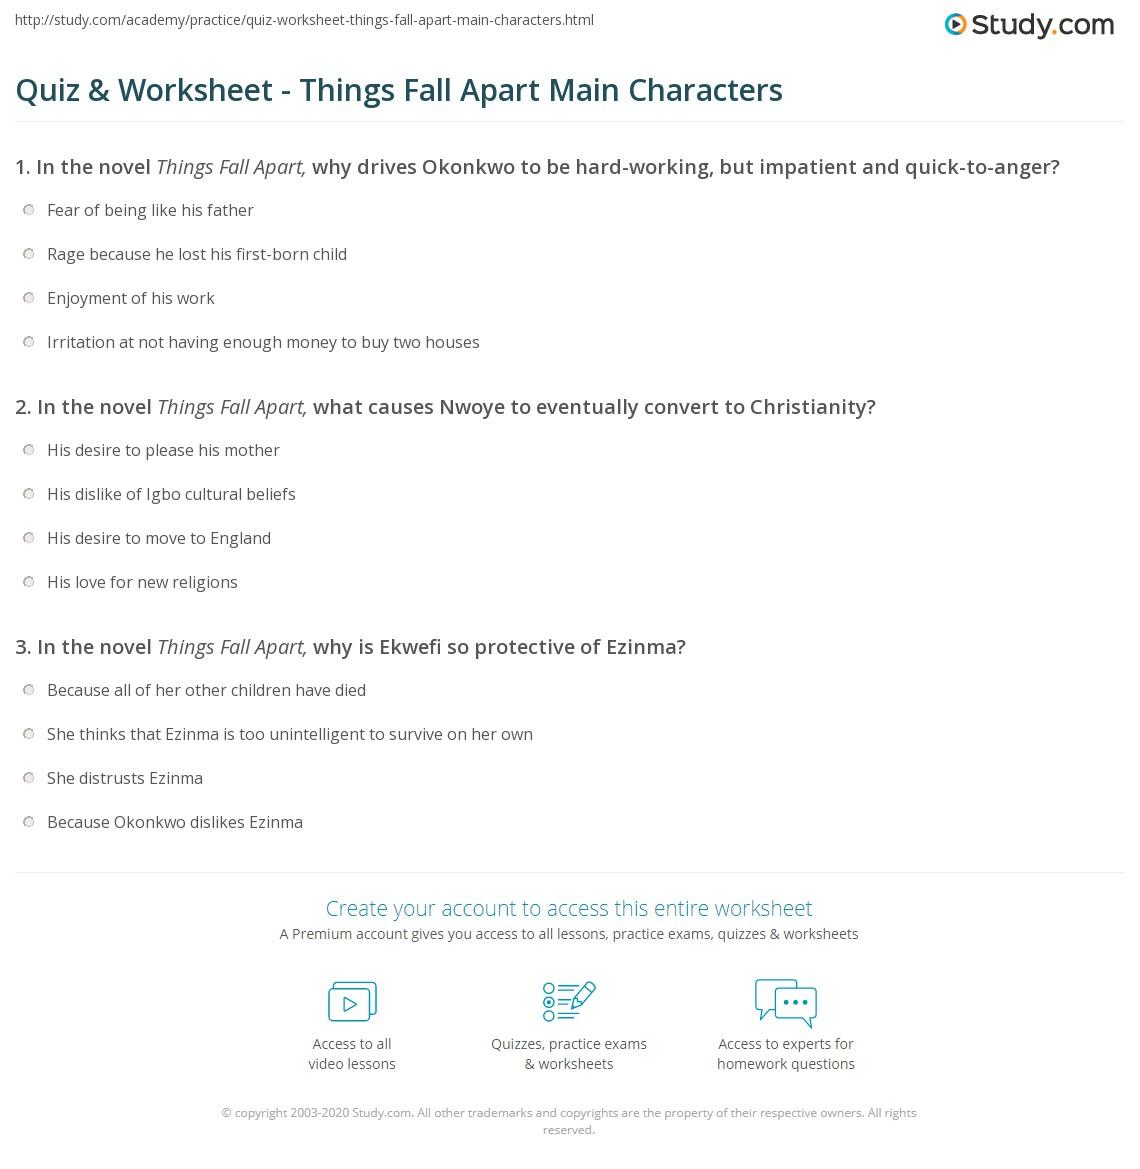 Quiz Worksheet Things Fall Apart Main Characters Study Com